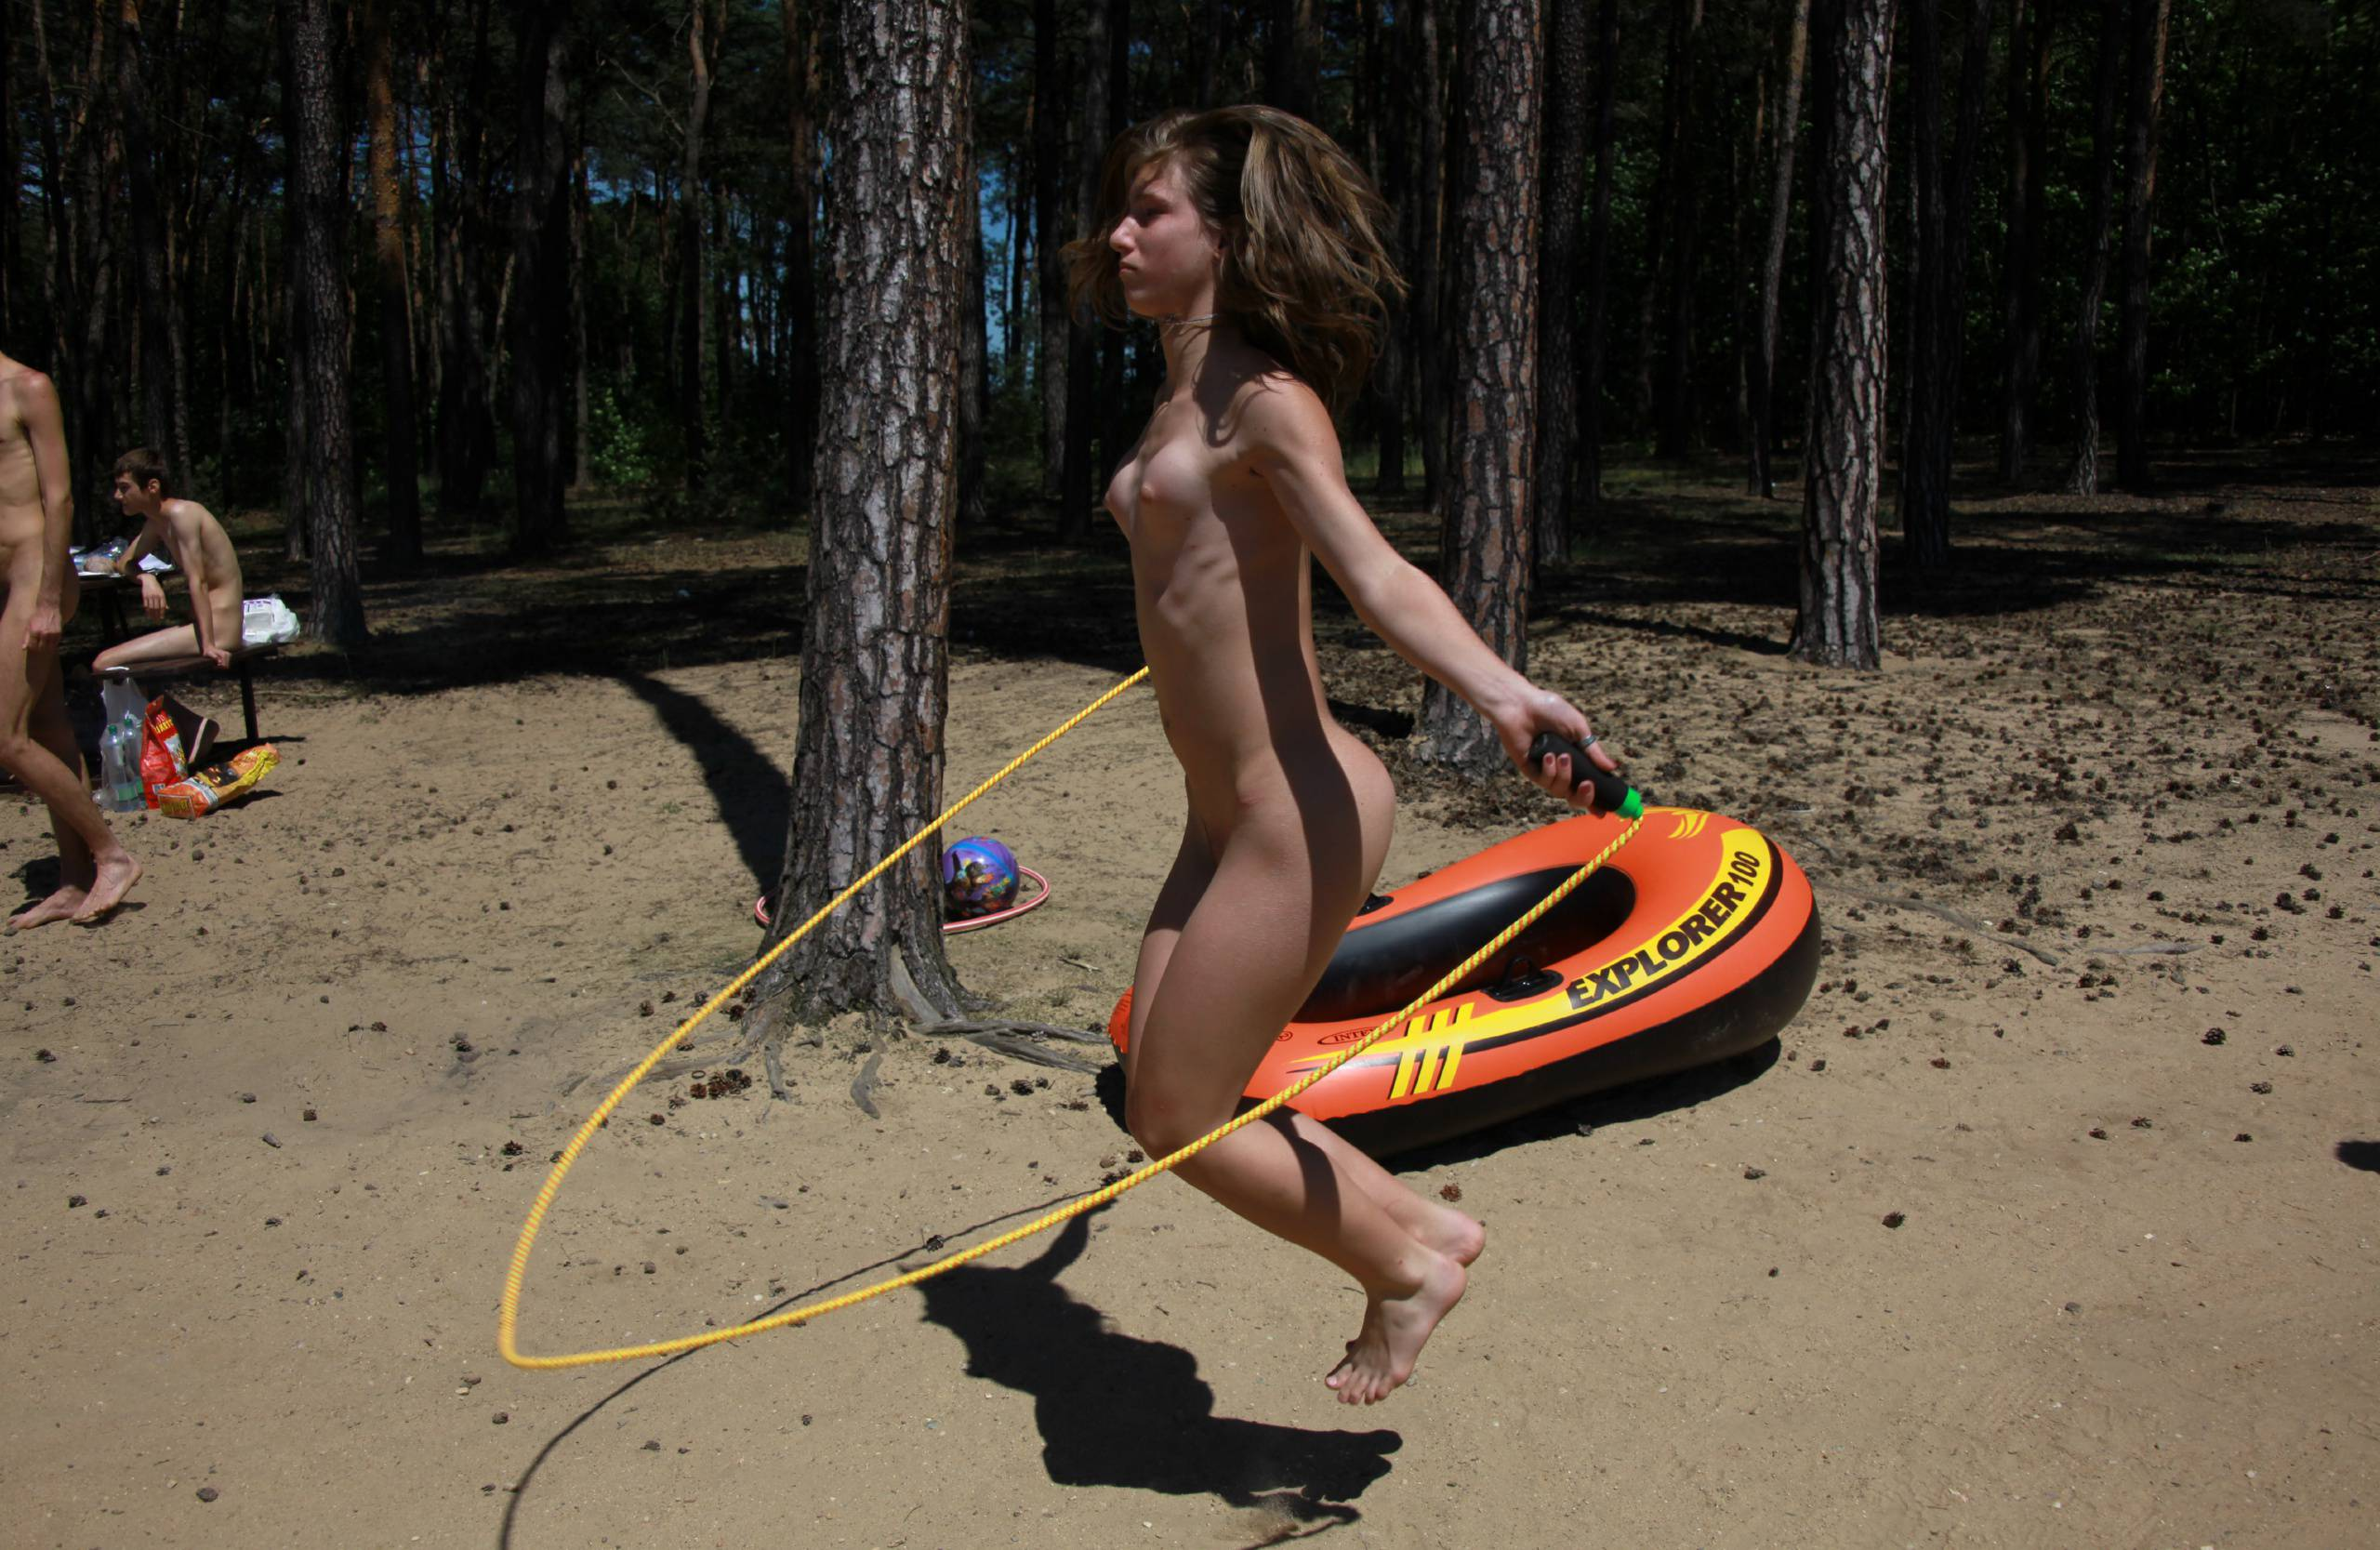 Summer Sun Nudists - 2